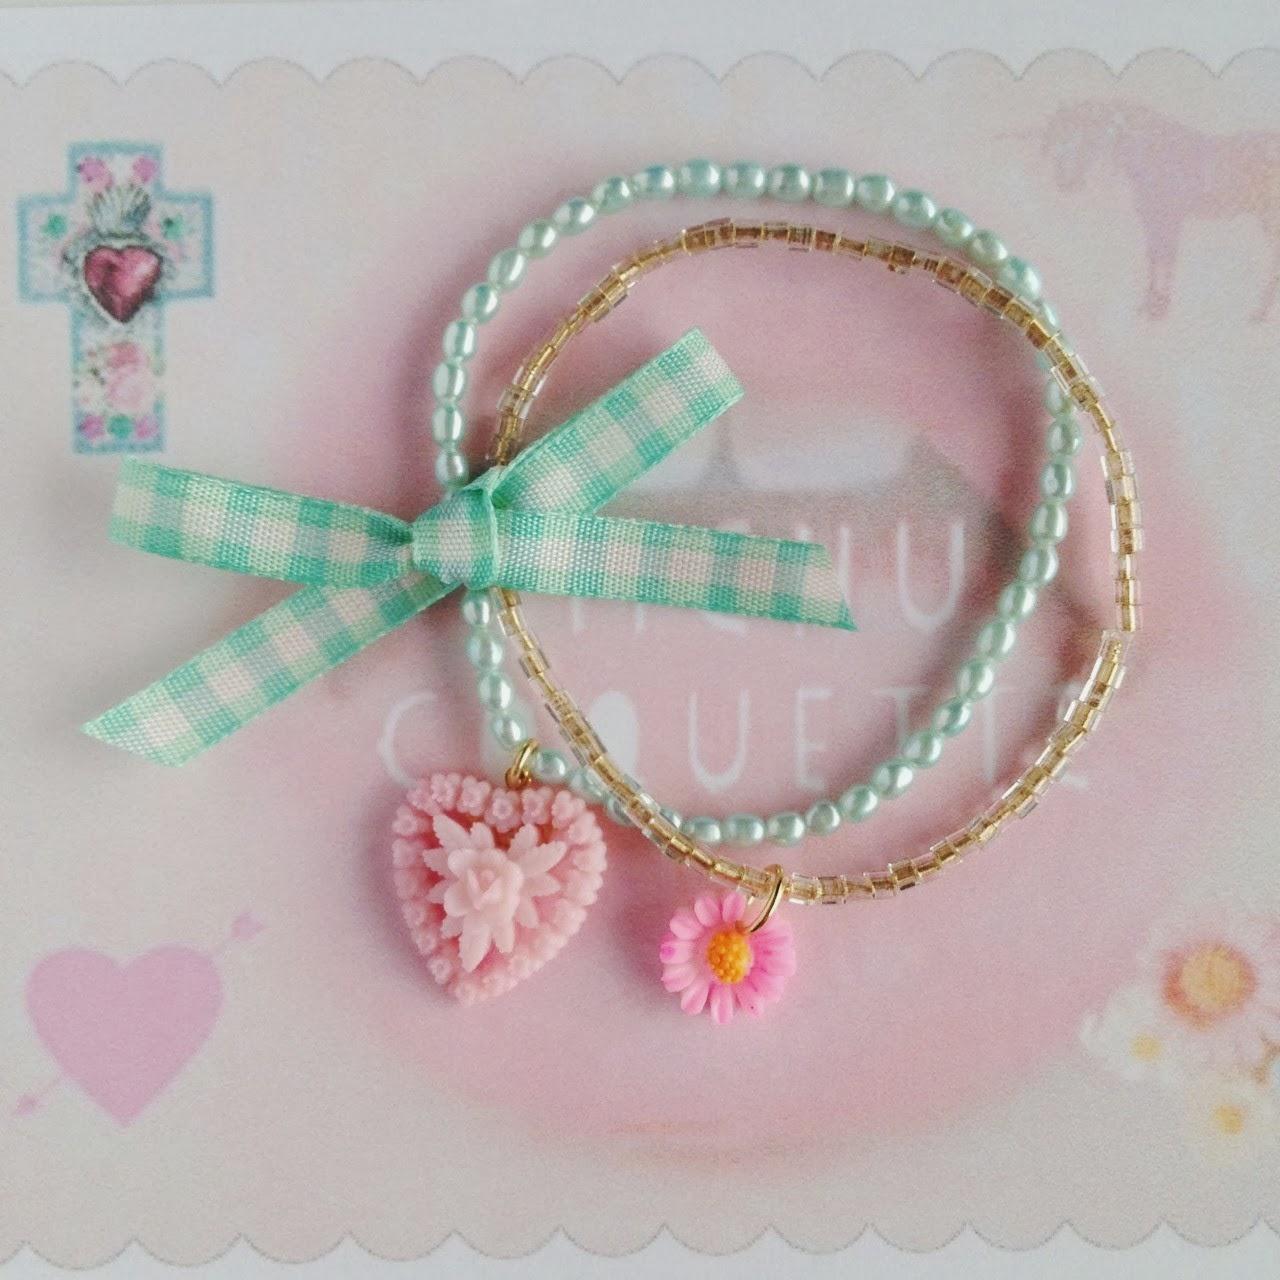 http://michu.shop-pro.jp/?mode=cate&cbid=1078897&csid=3